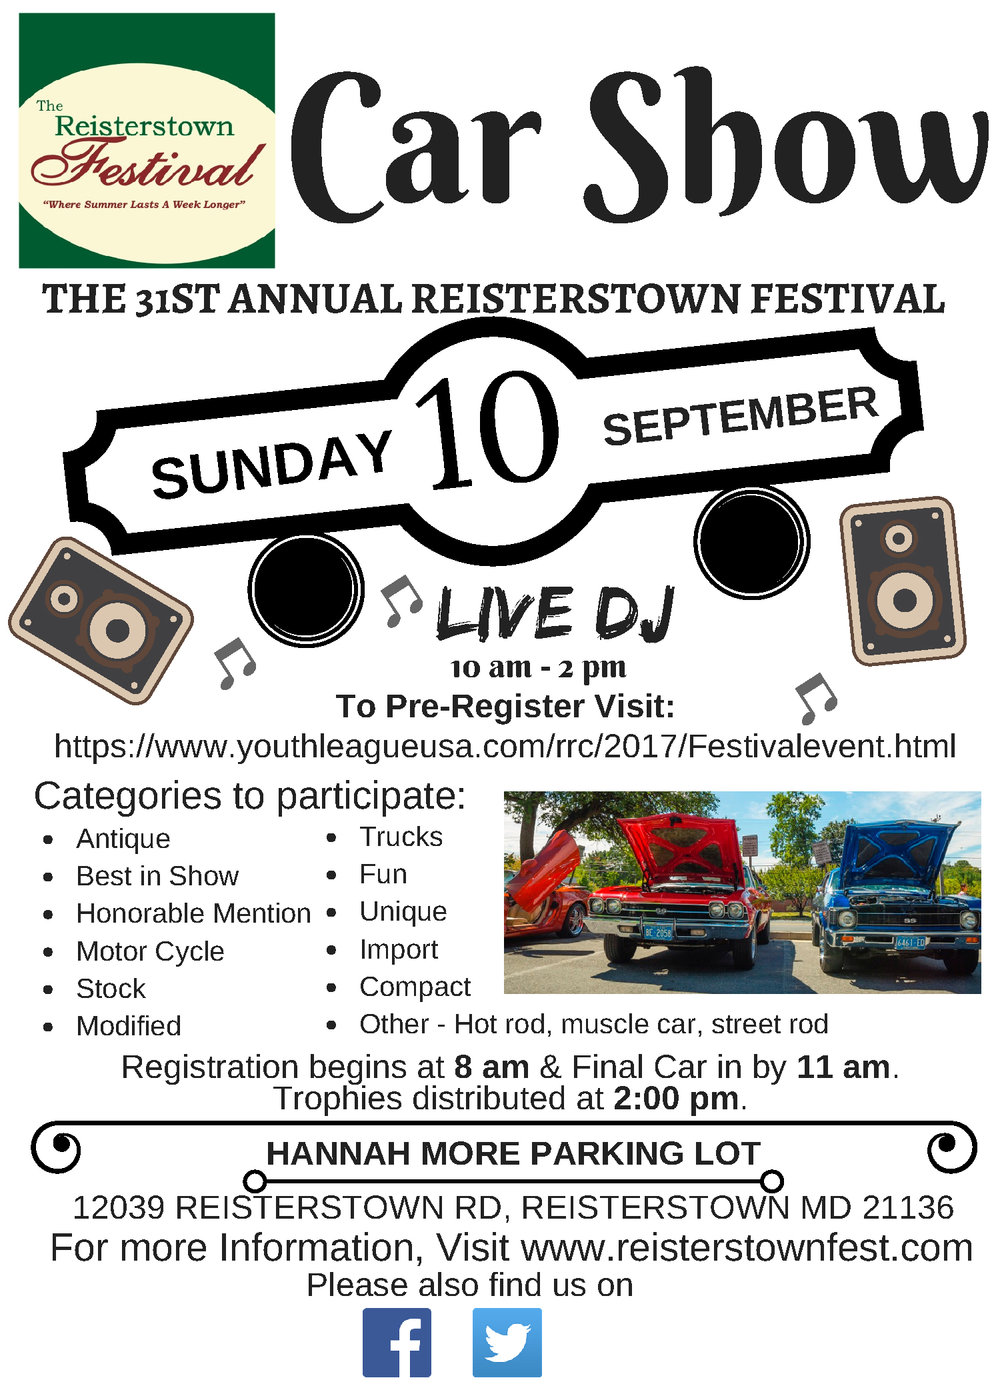 Reisterstown Festival Car Show 2017 - Michael Fortier.jpg